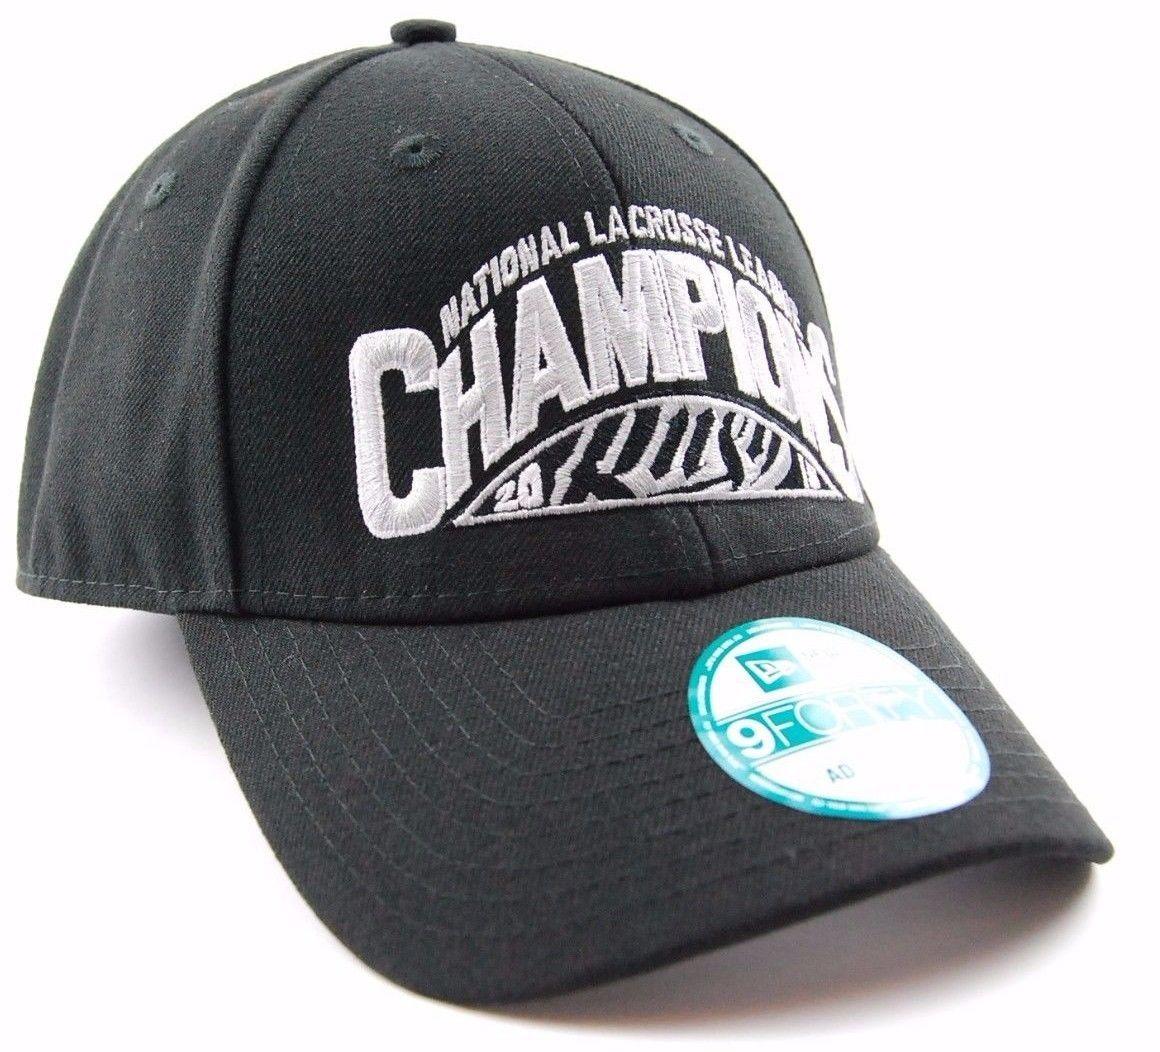 Saskatchewan Rush New Era 9FORTY 2015 NLL Champions Lacrosse Cap Hat  OSFM